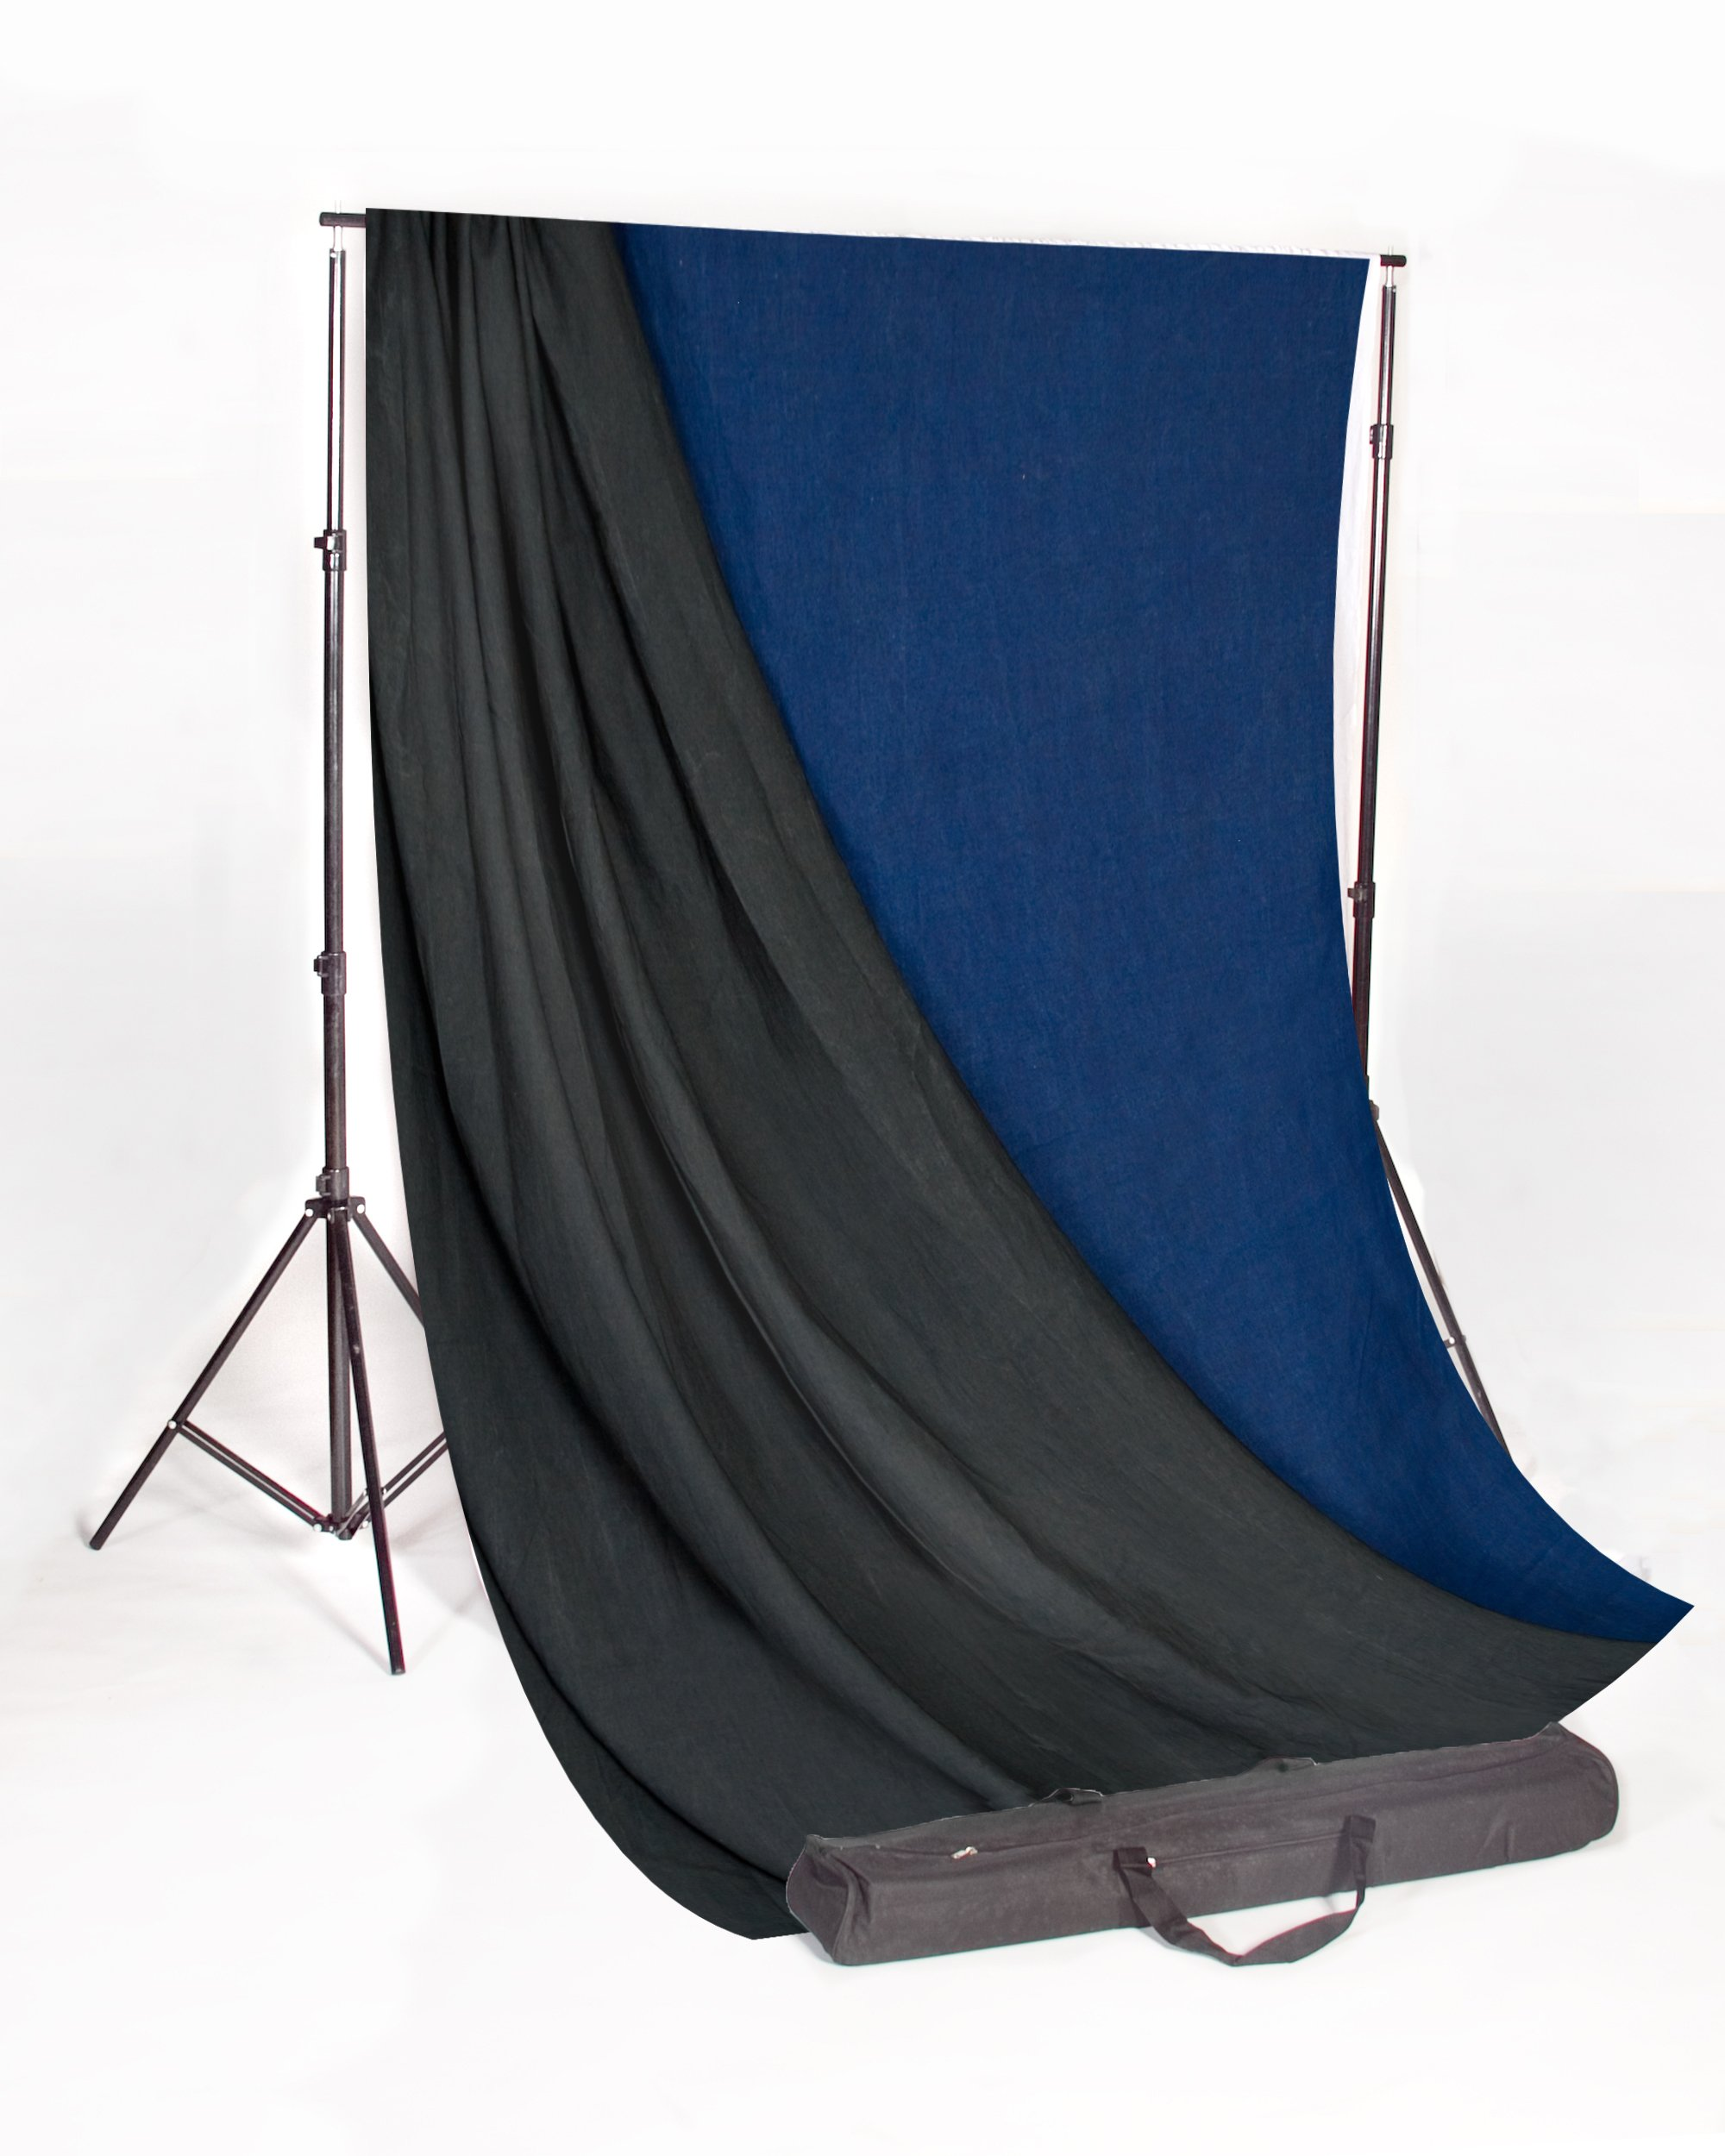 Backdrop Alley Medium Blue/Graphite Reversible Muslin Photo Background, 10' x 12'